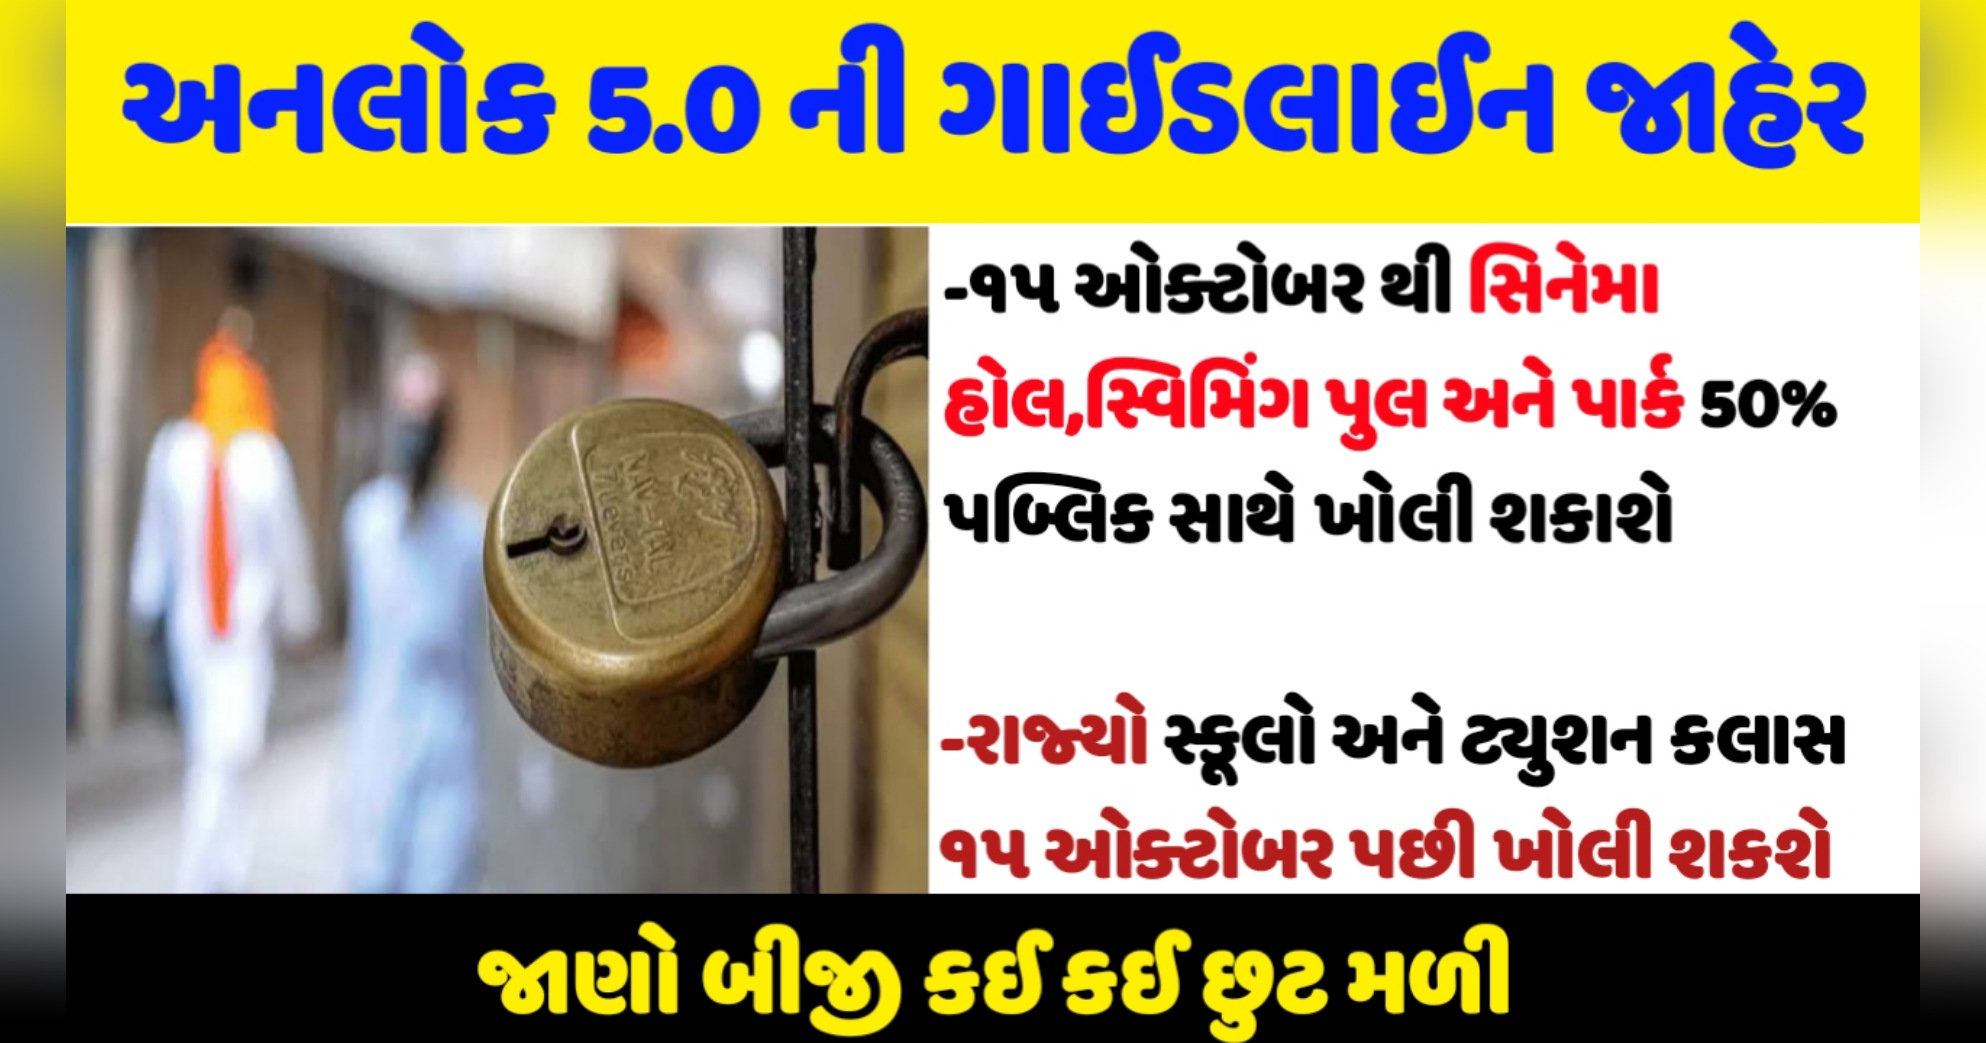 Unlock 5.0.Guidelines Declared By MHA